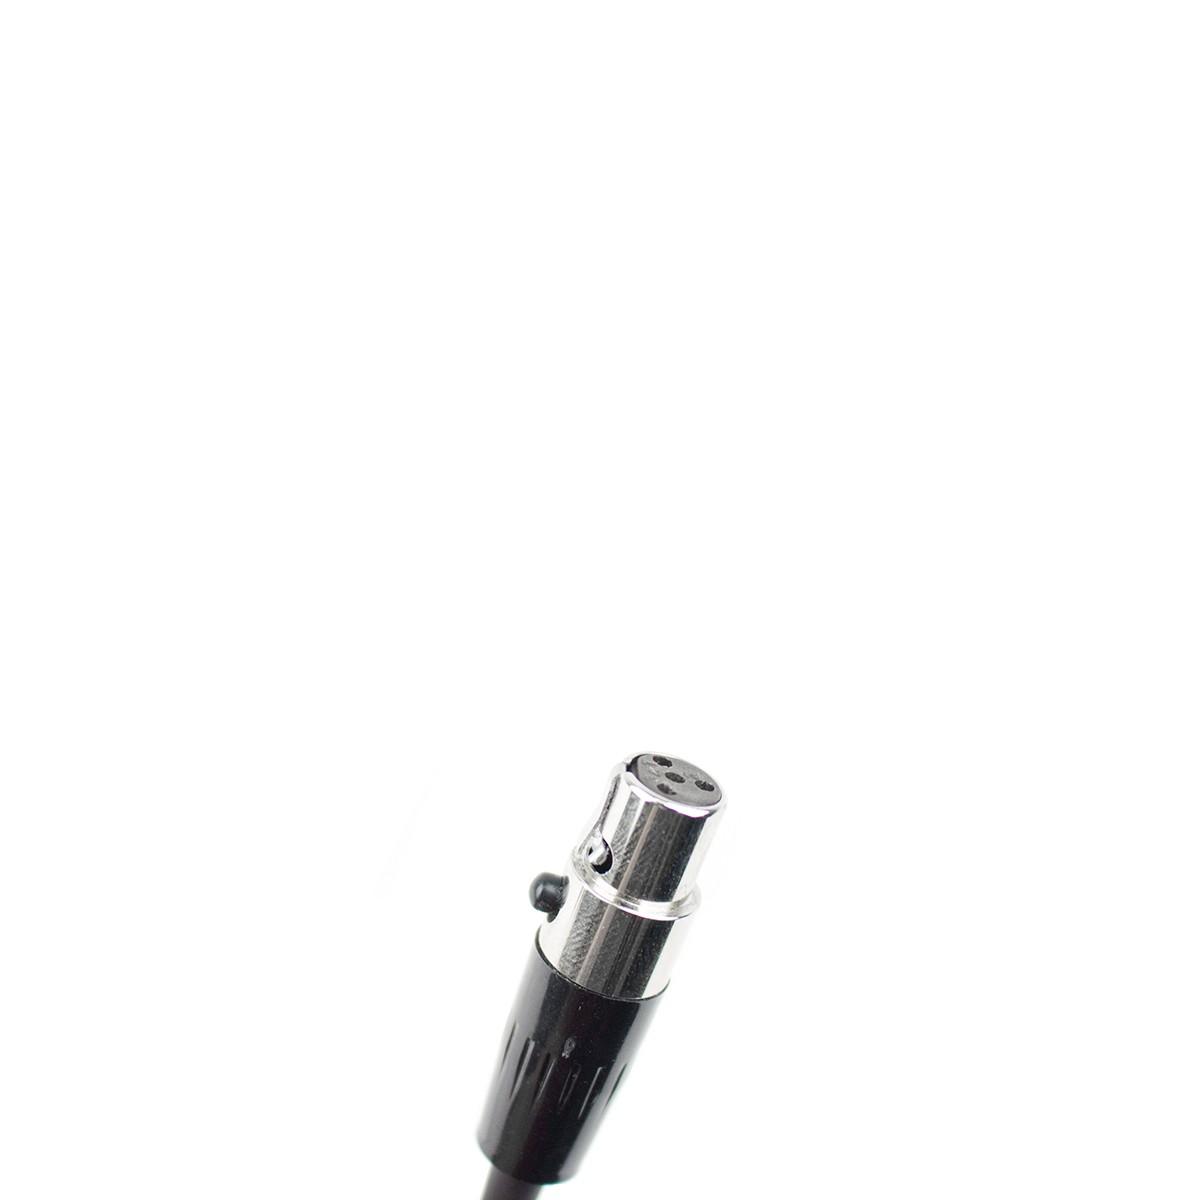 Microfone c/ Fio Lapela - WL 93 Shure